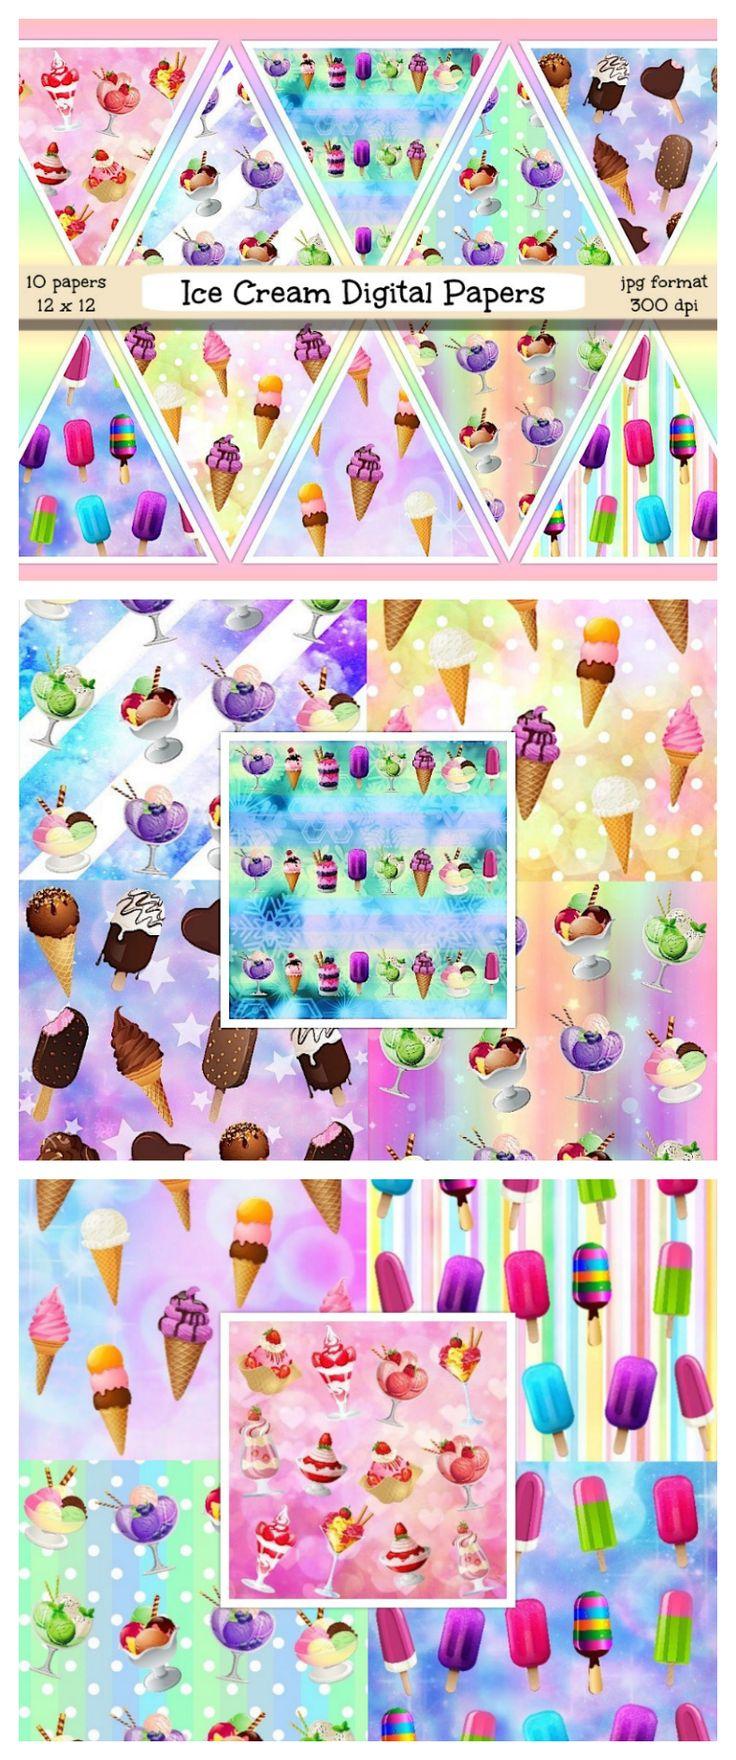 Scrapbook paper kawaii - Ice Cream Digital Paper Ice Cream Scrapbook Papers Ice Cream Textures Ice Cream Backgrounds Summer Pastel Paper Kawaii Papers Scrapbooking